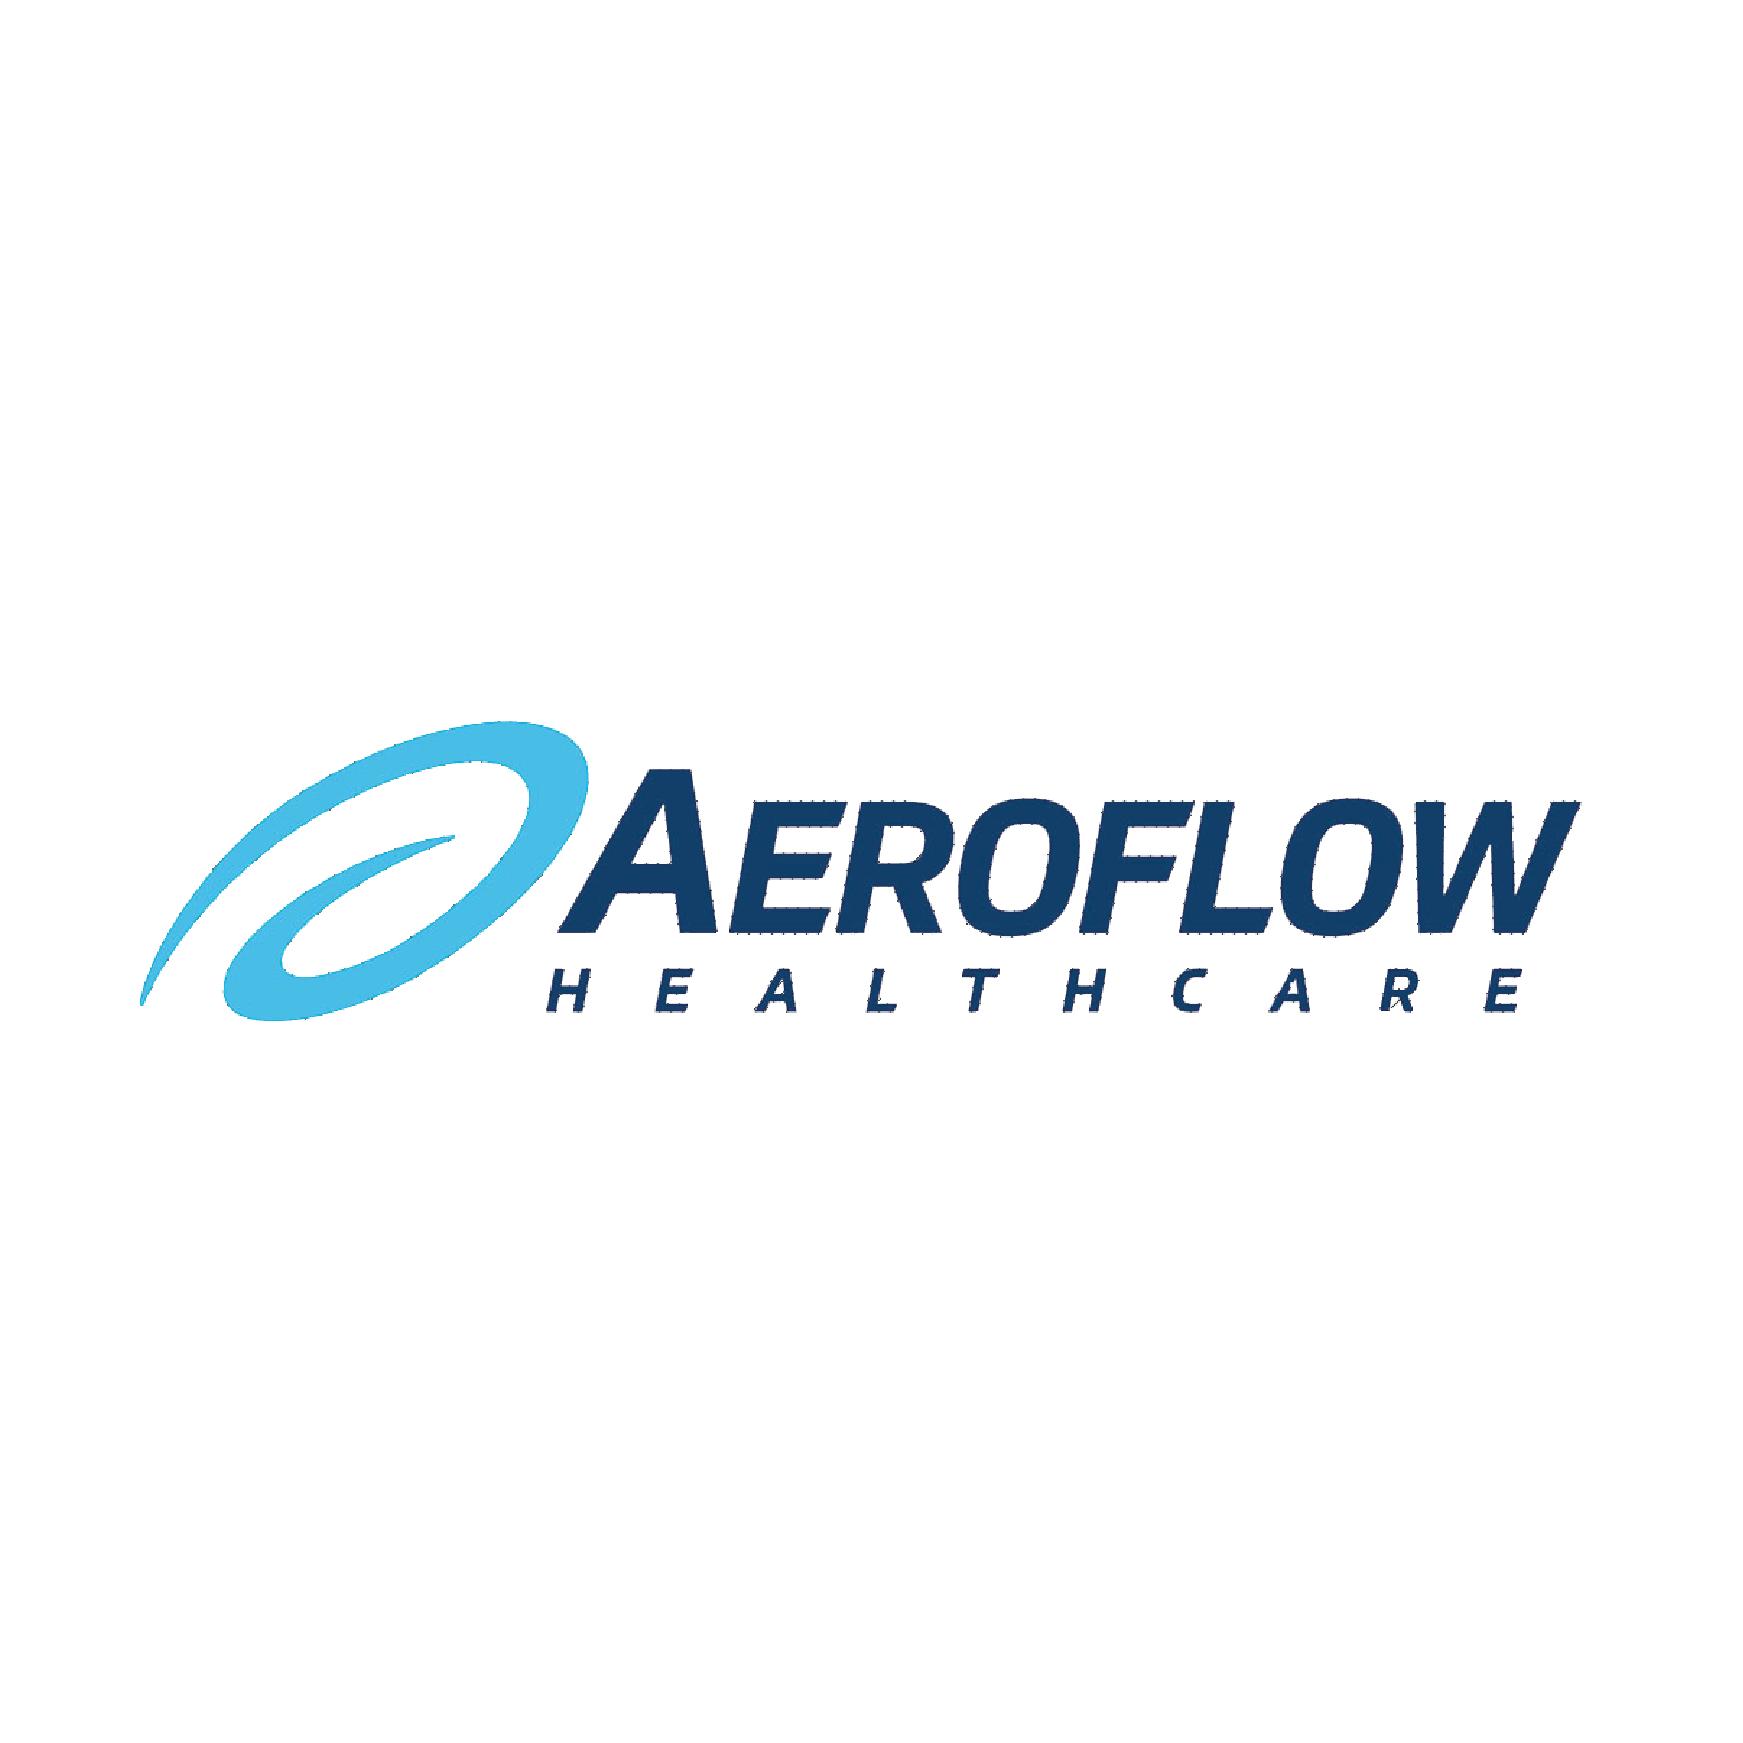 Copy of Aeroflow Healthcare